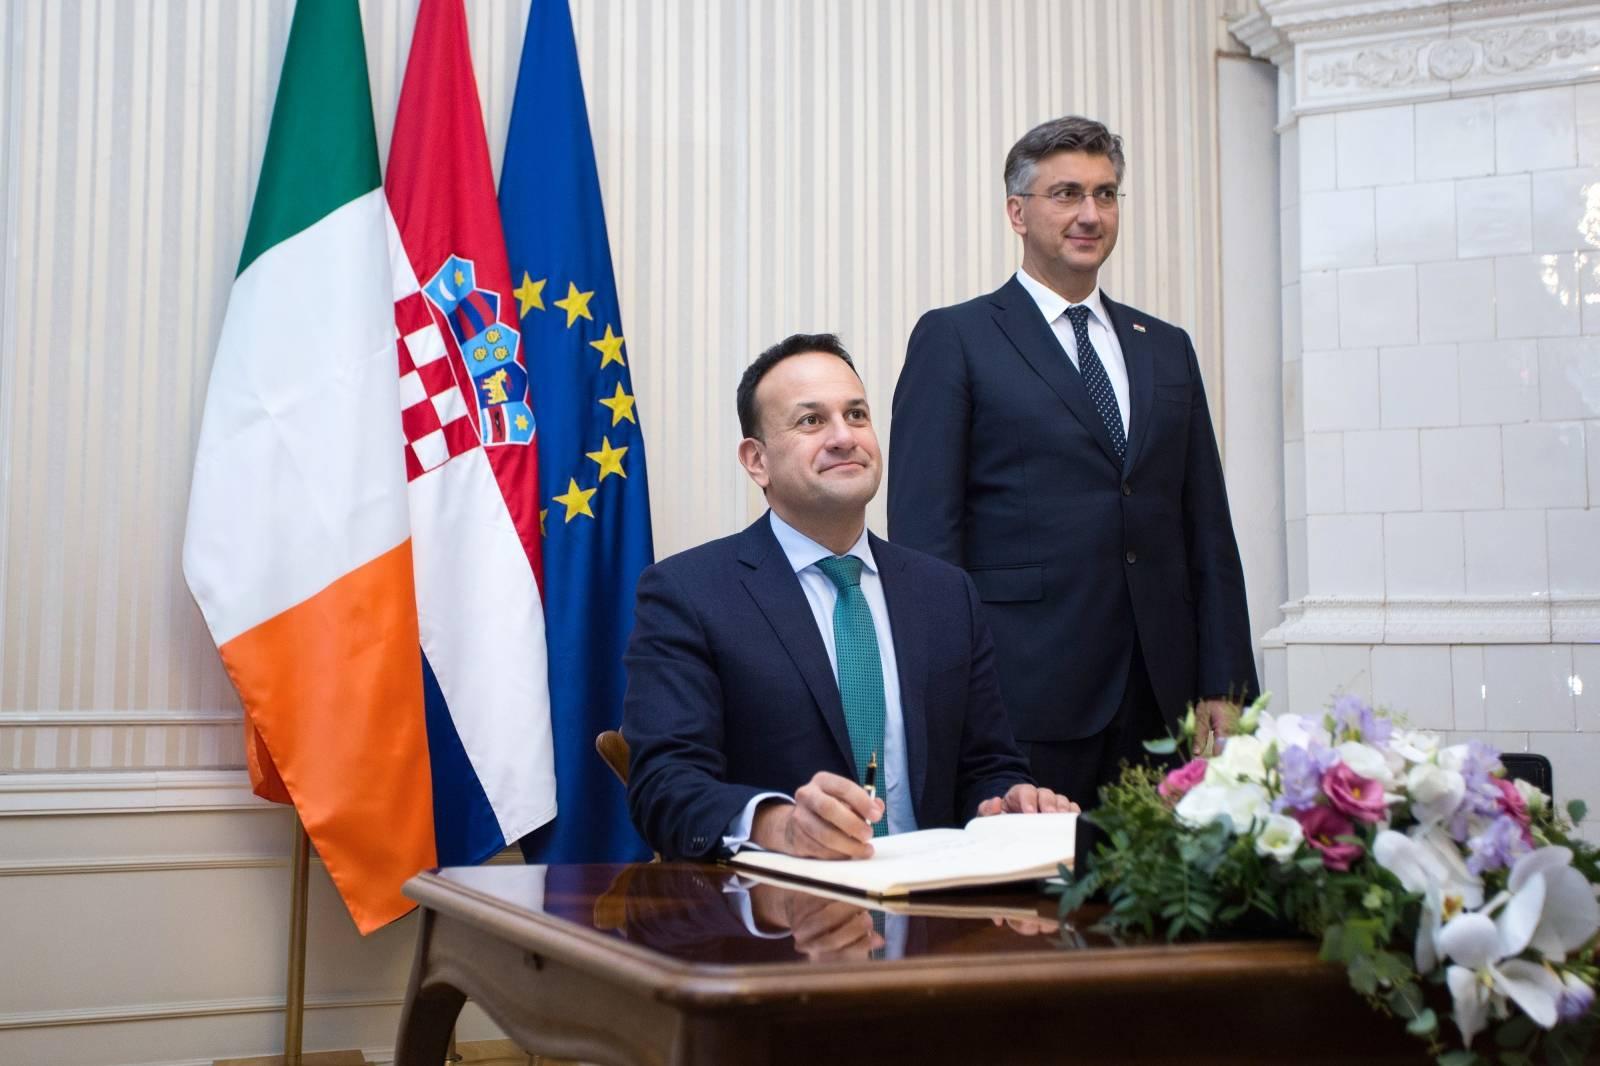 Sastanak Andreja Plenkovića s predsjednikom Vlade Irske Leom Varadkarom